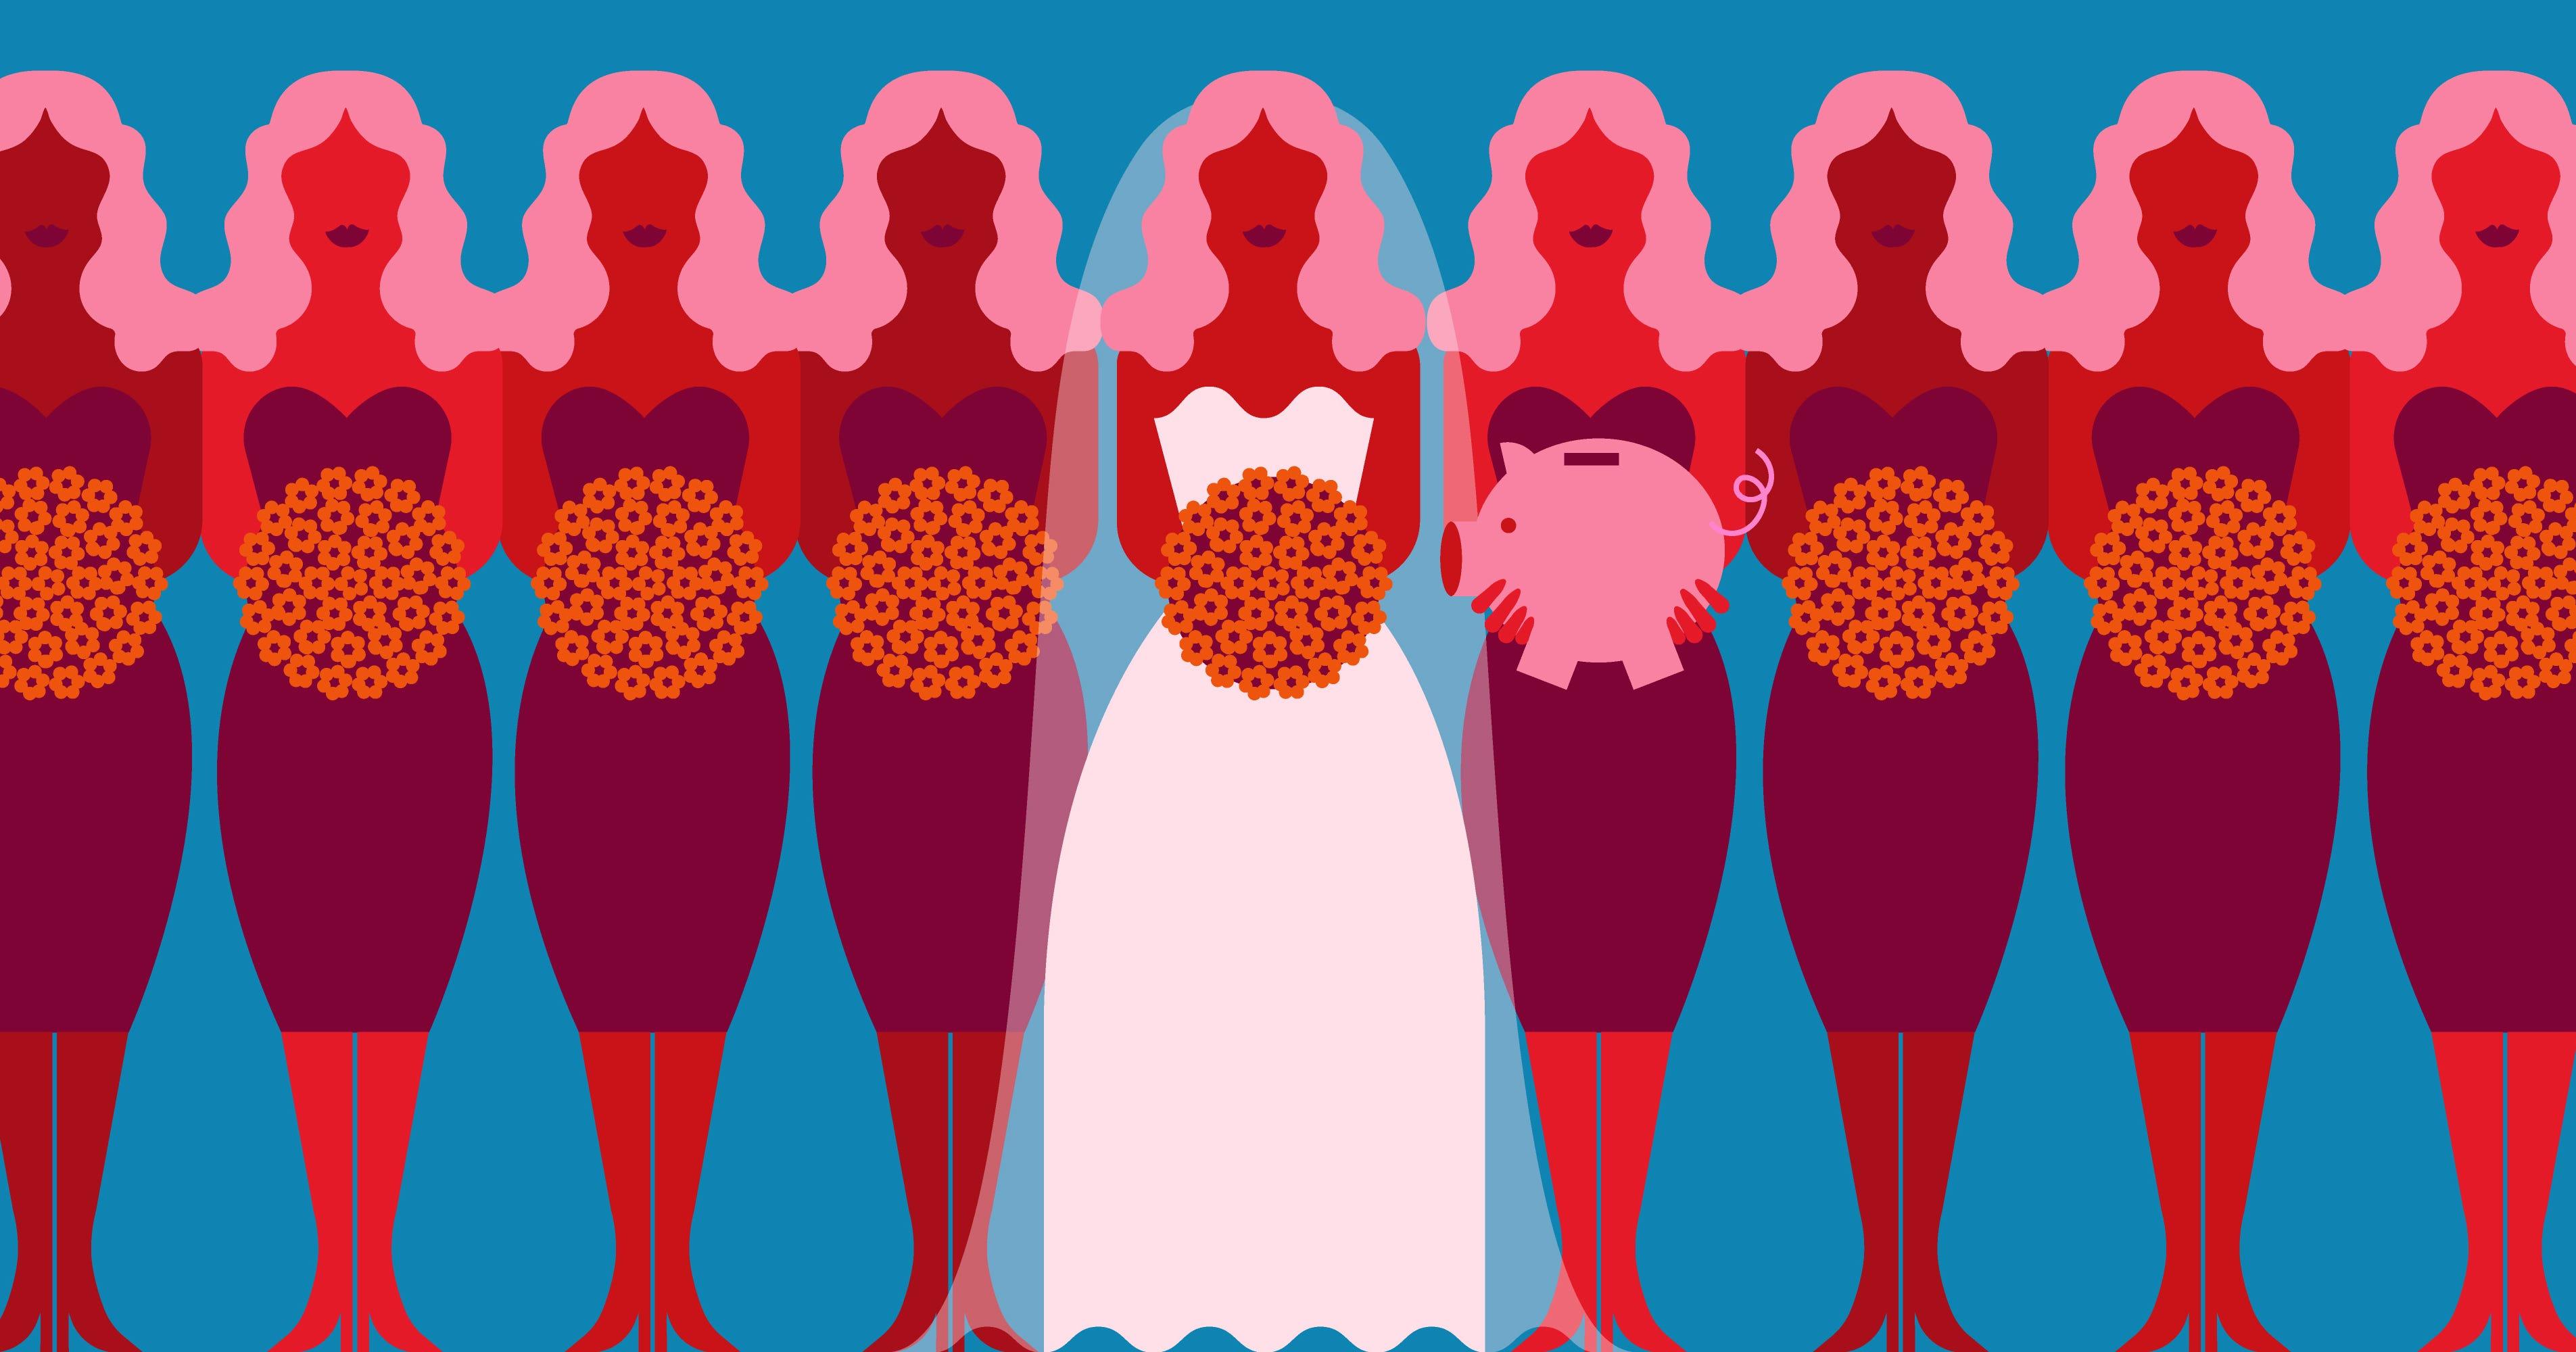 How Much Money Millennial Women Save To Attend Weddings